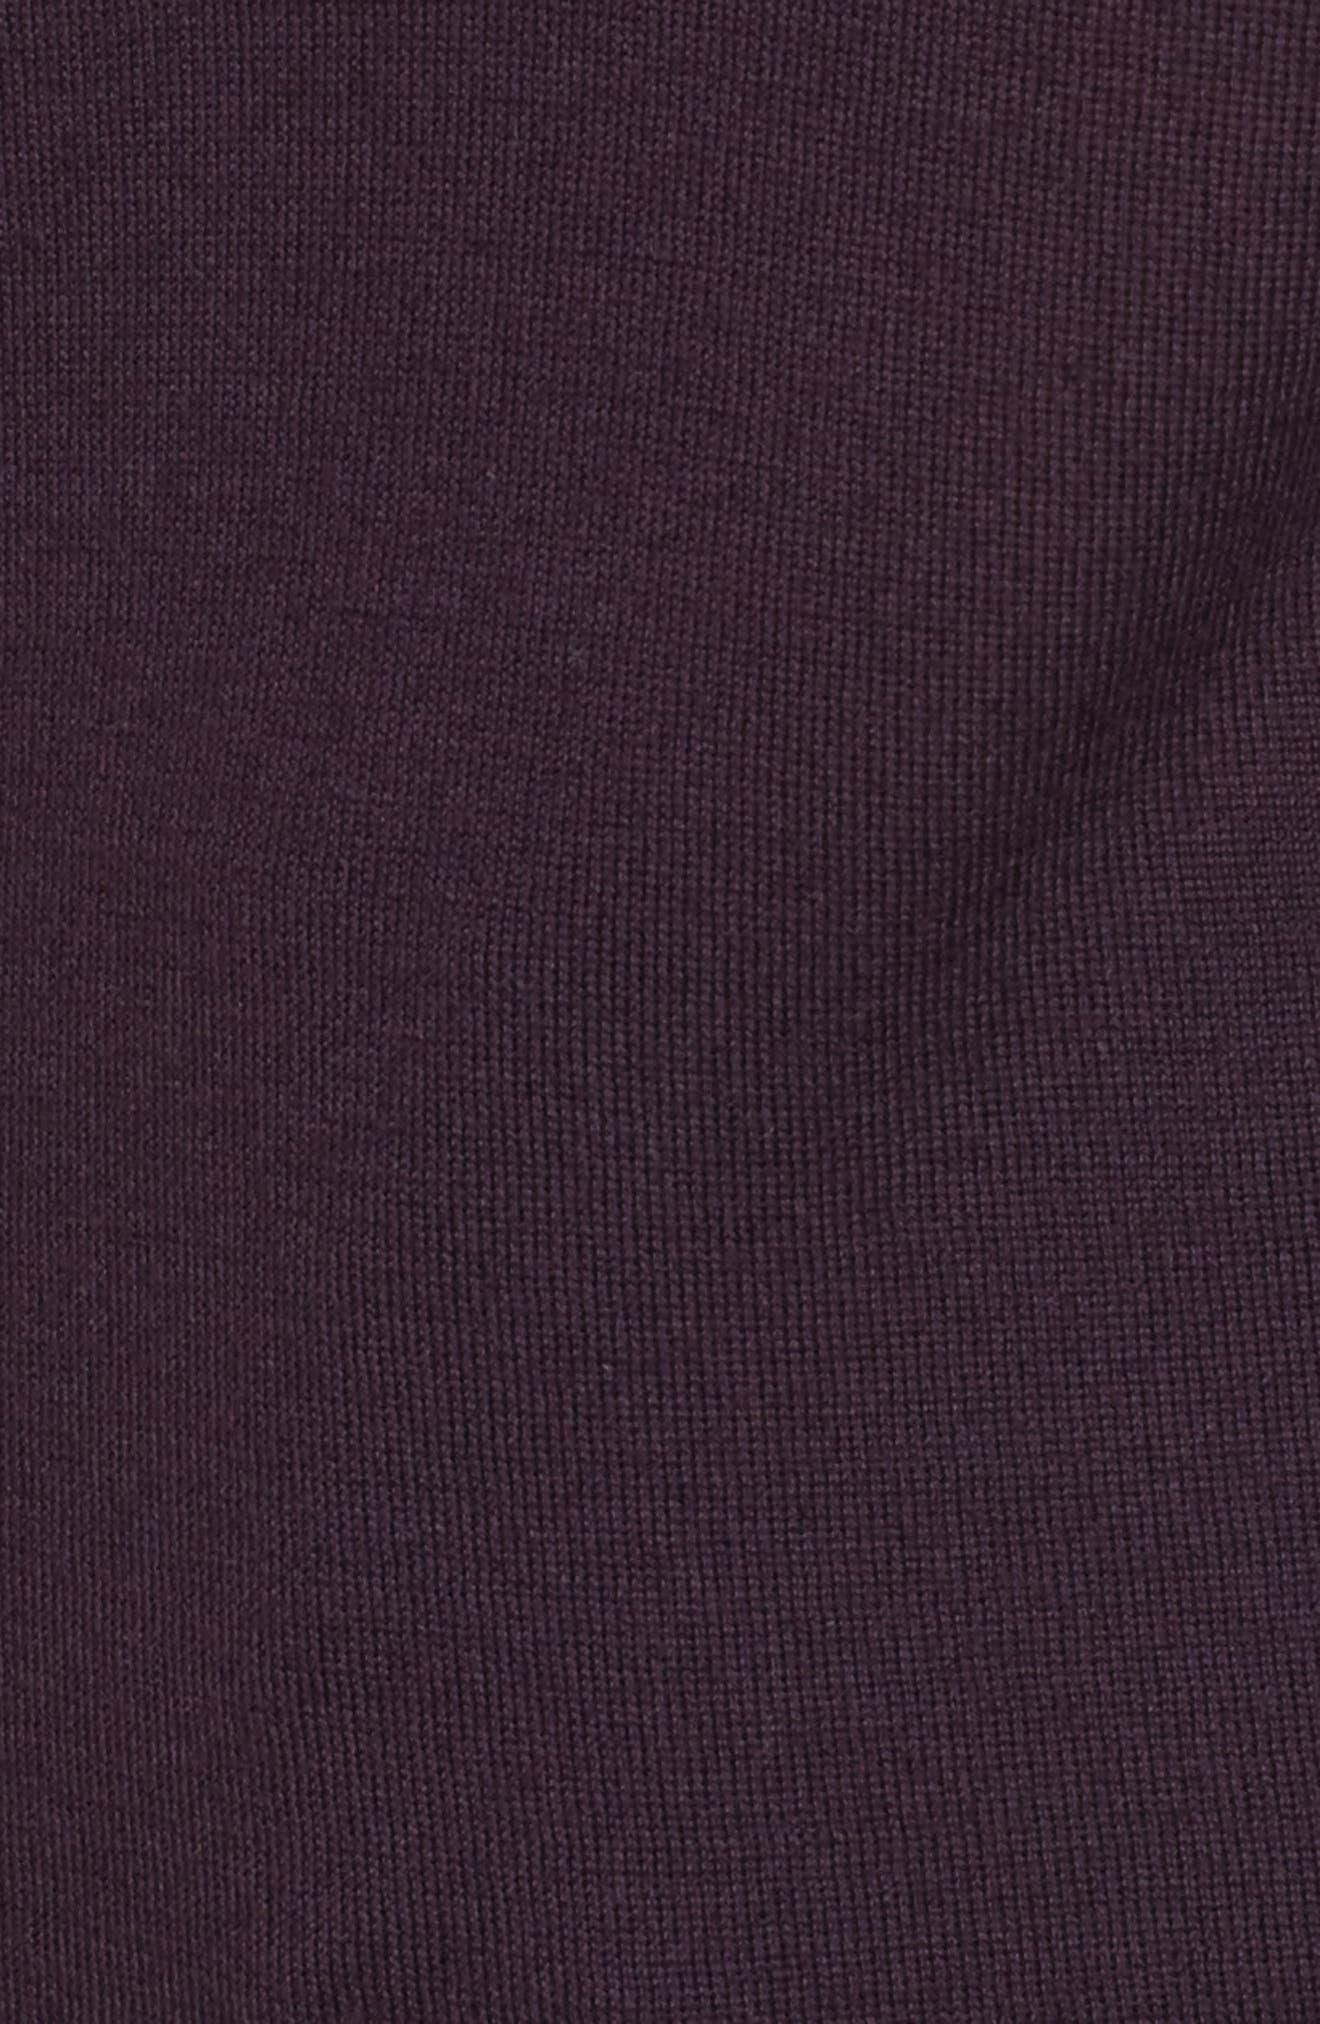 Castle of Salazar Sweater,                             Alternate thumbnail 5, color,                             505